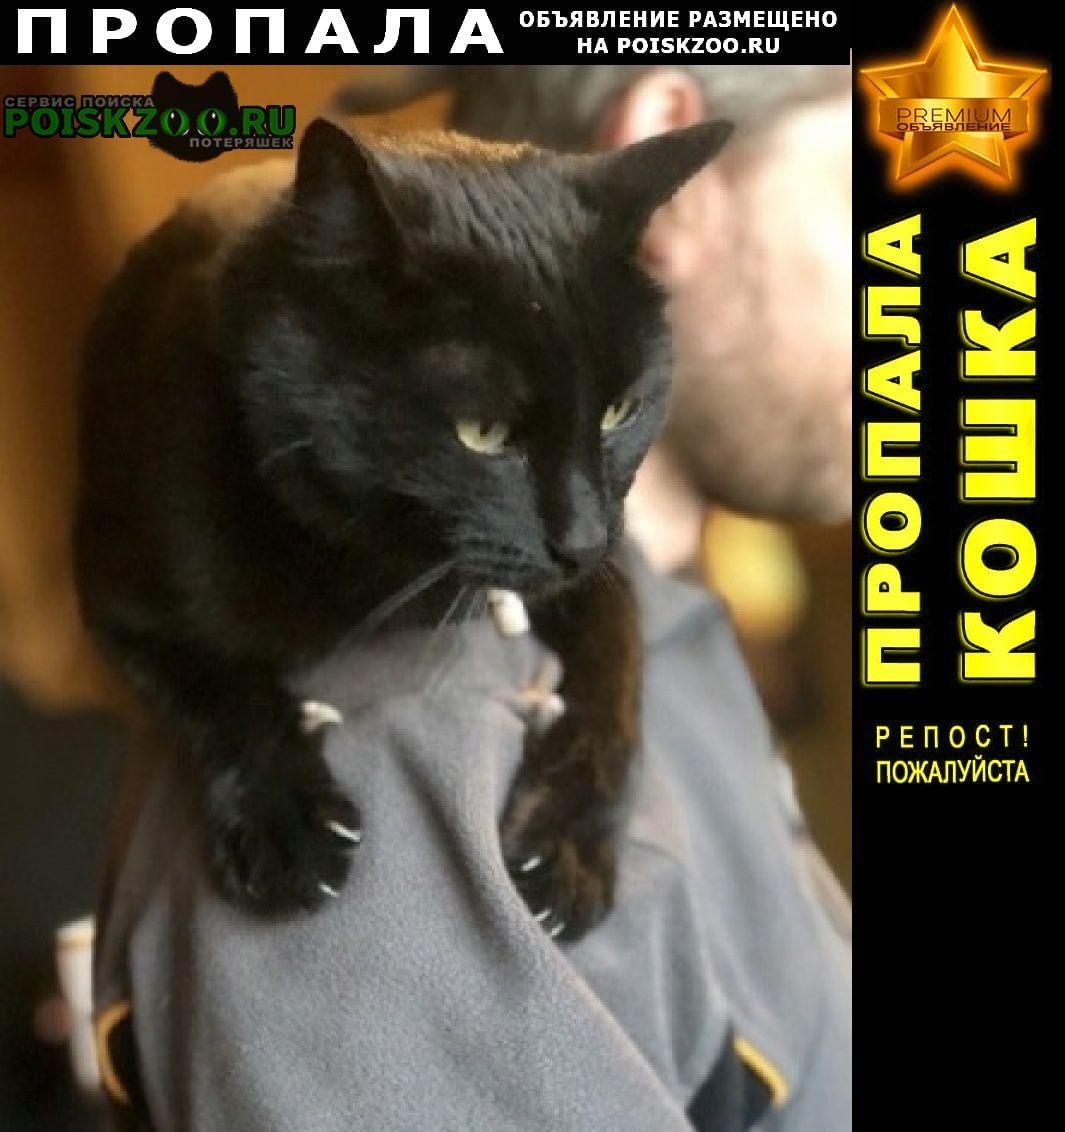 Пропал кот, кличка саймон г.Пермь